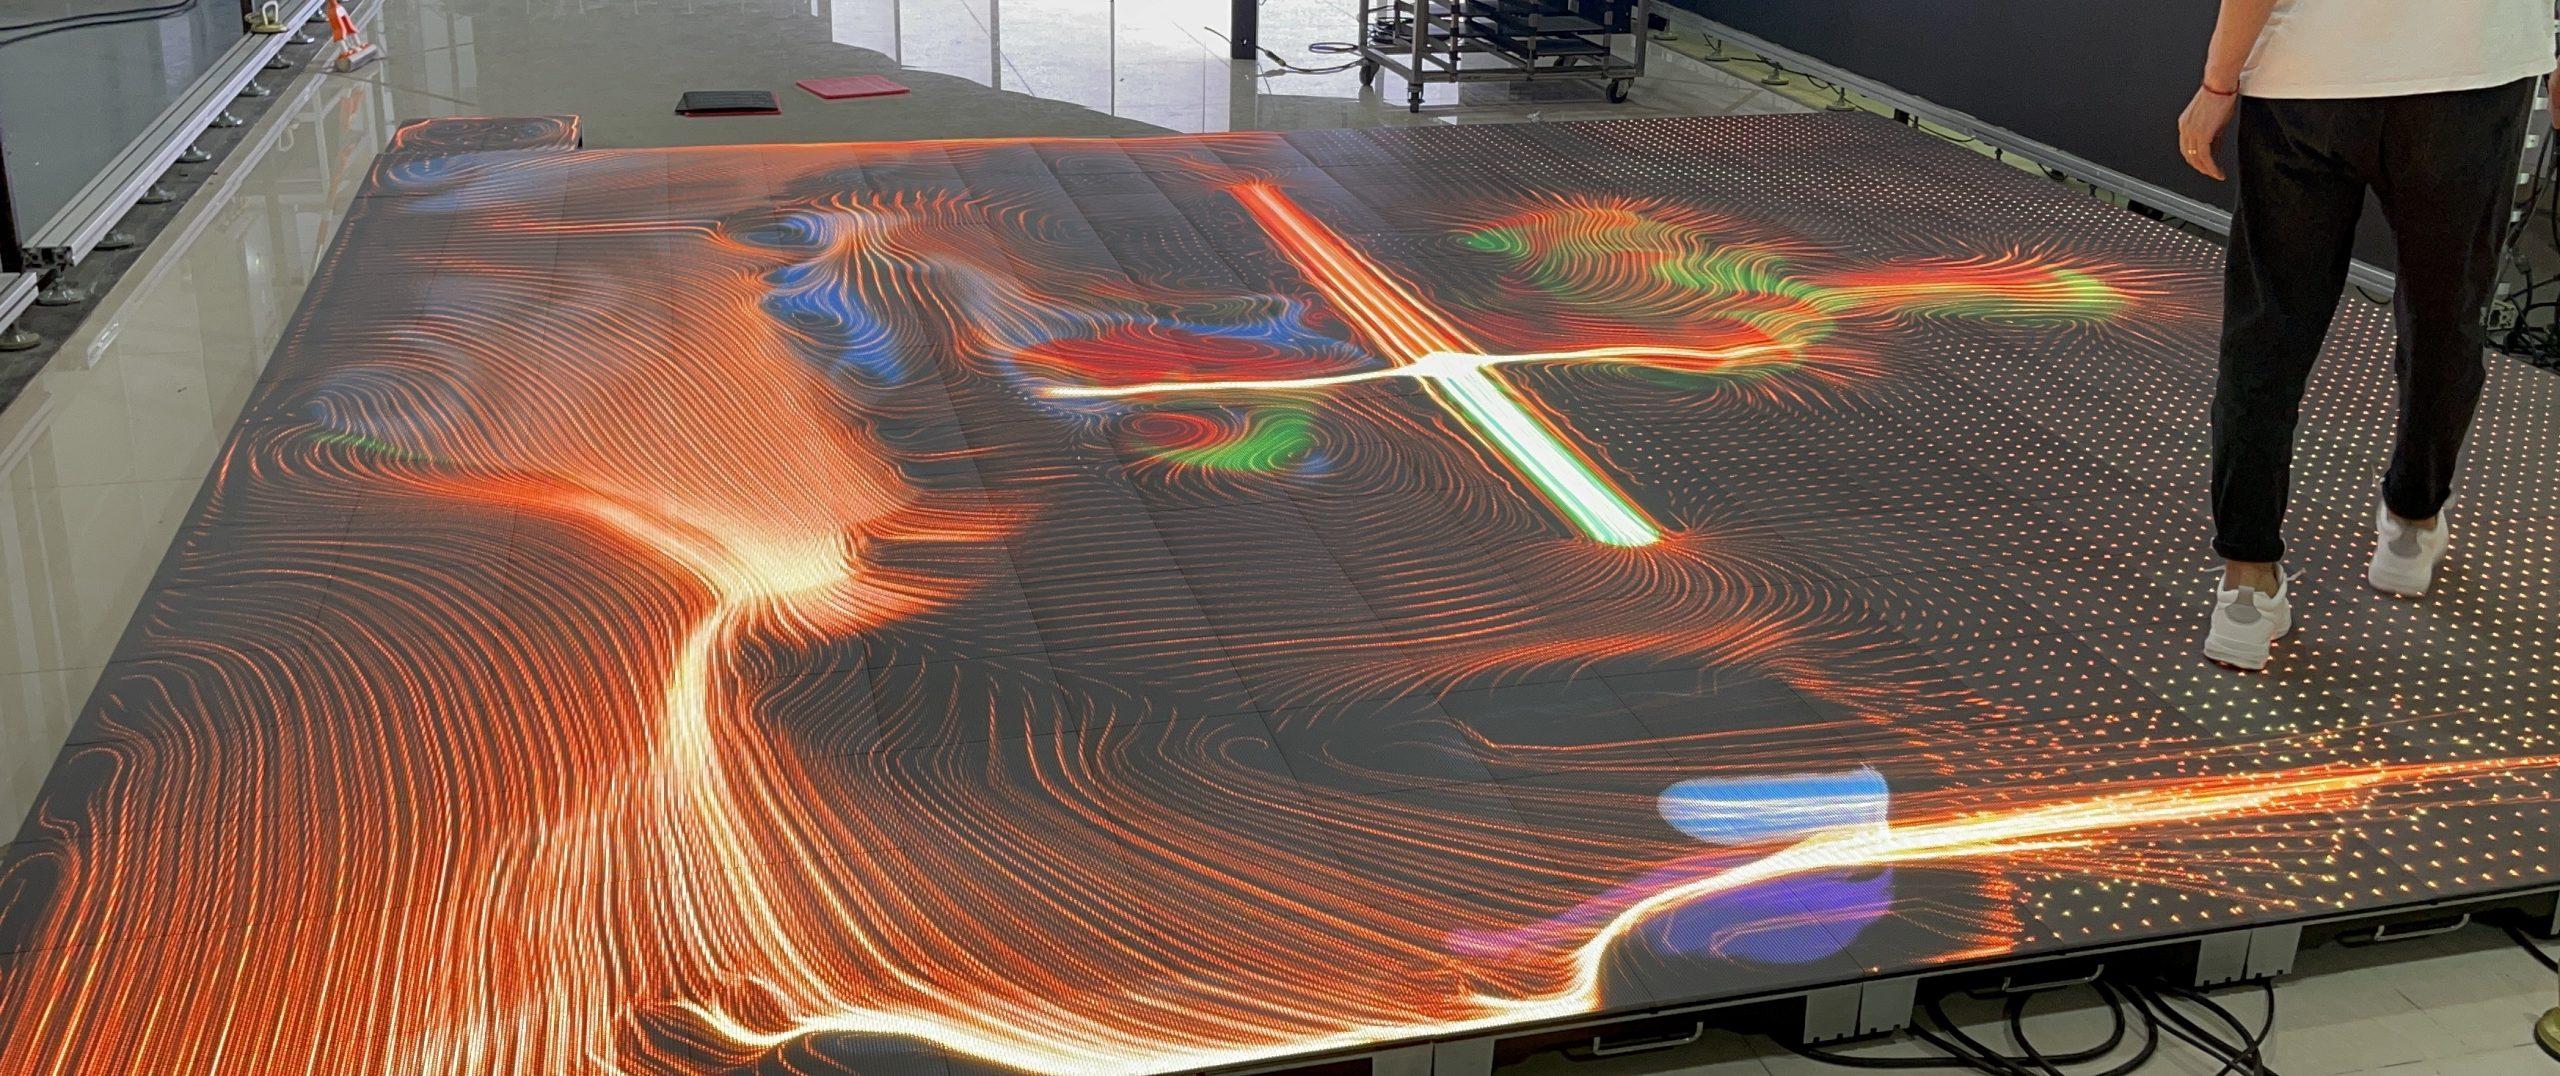 led floor intereactive findsbury